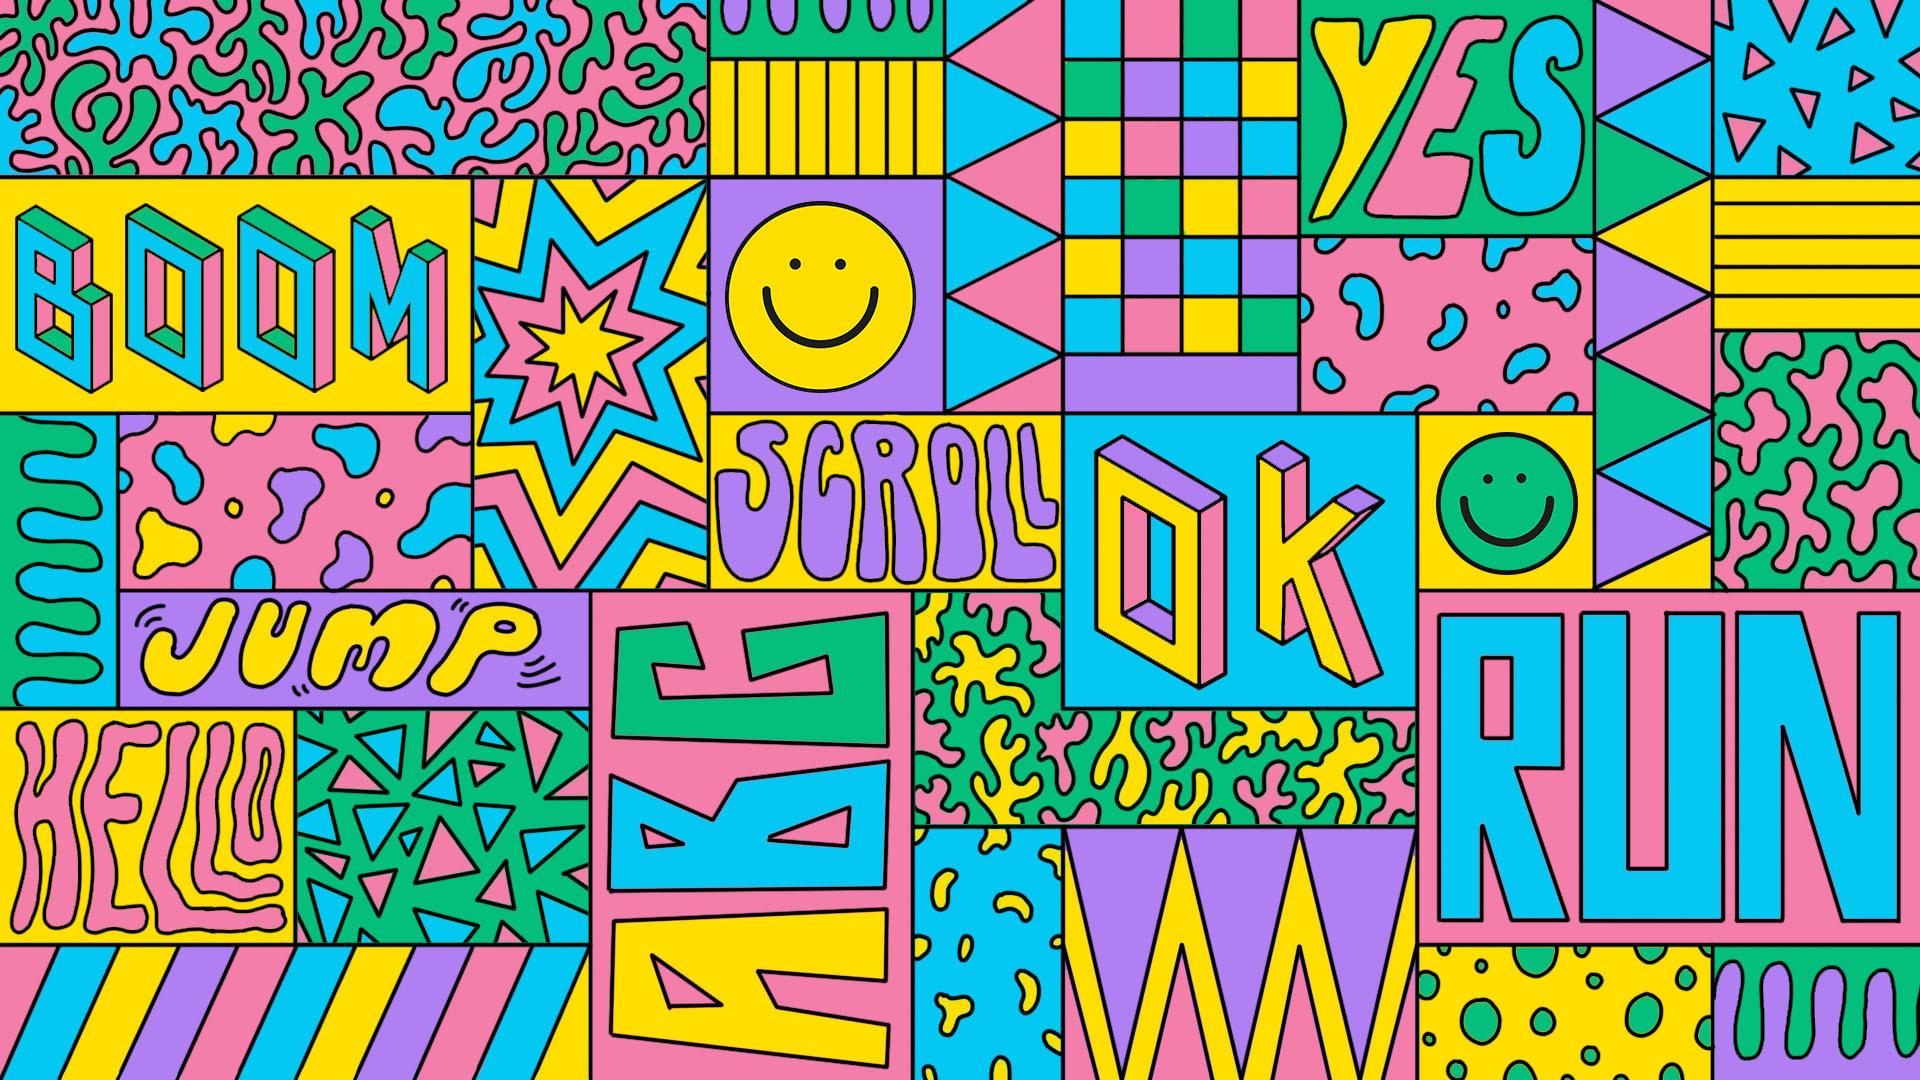 Graphic design by Ailish Beadle